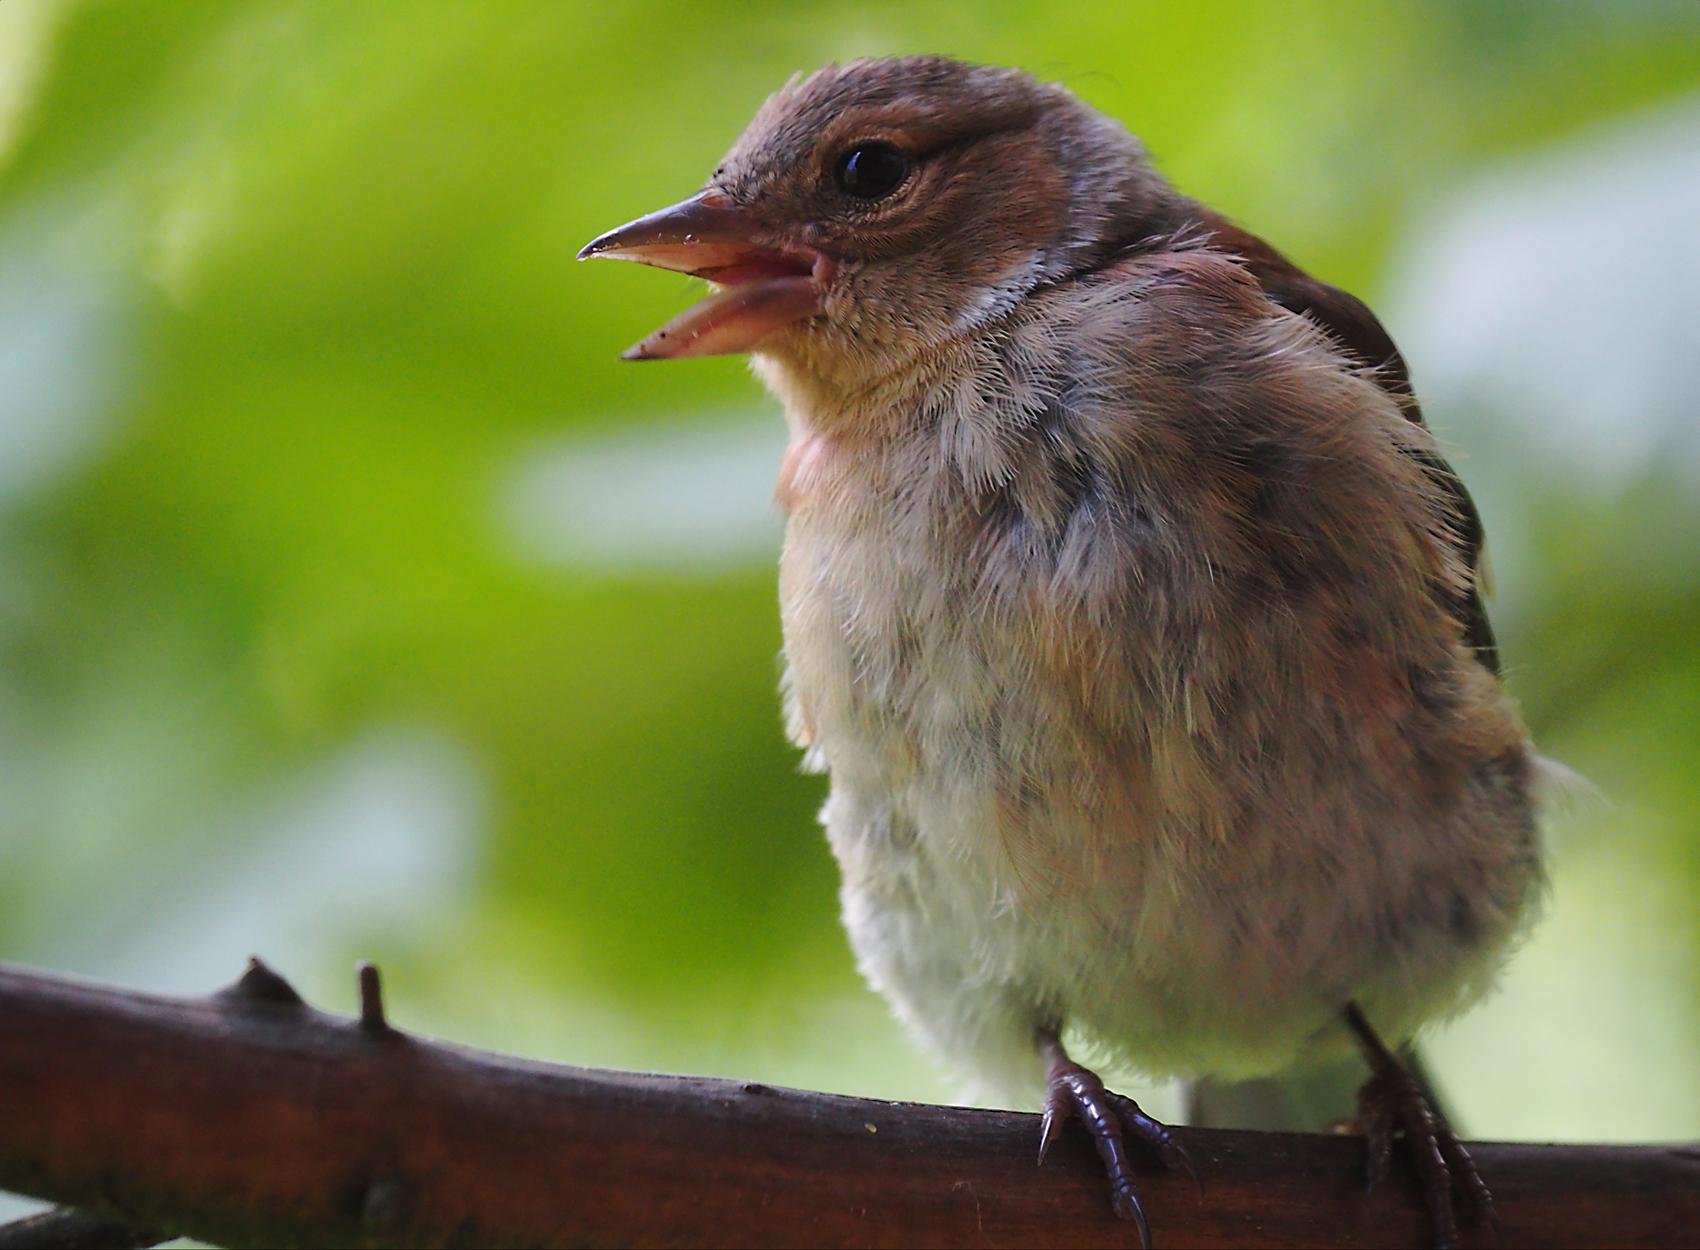 Buchfink juvenil02 (Fringilla coelebs)